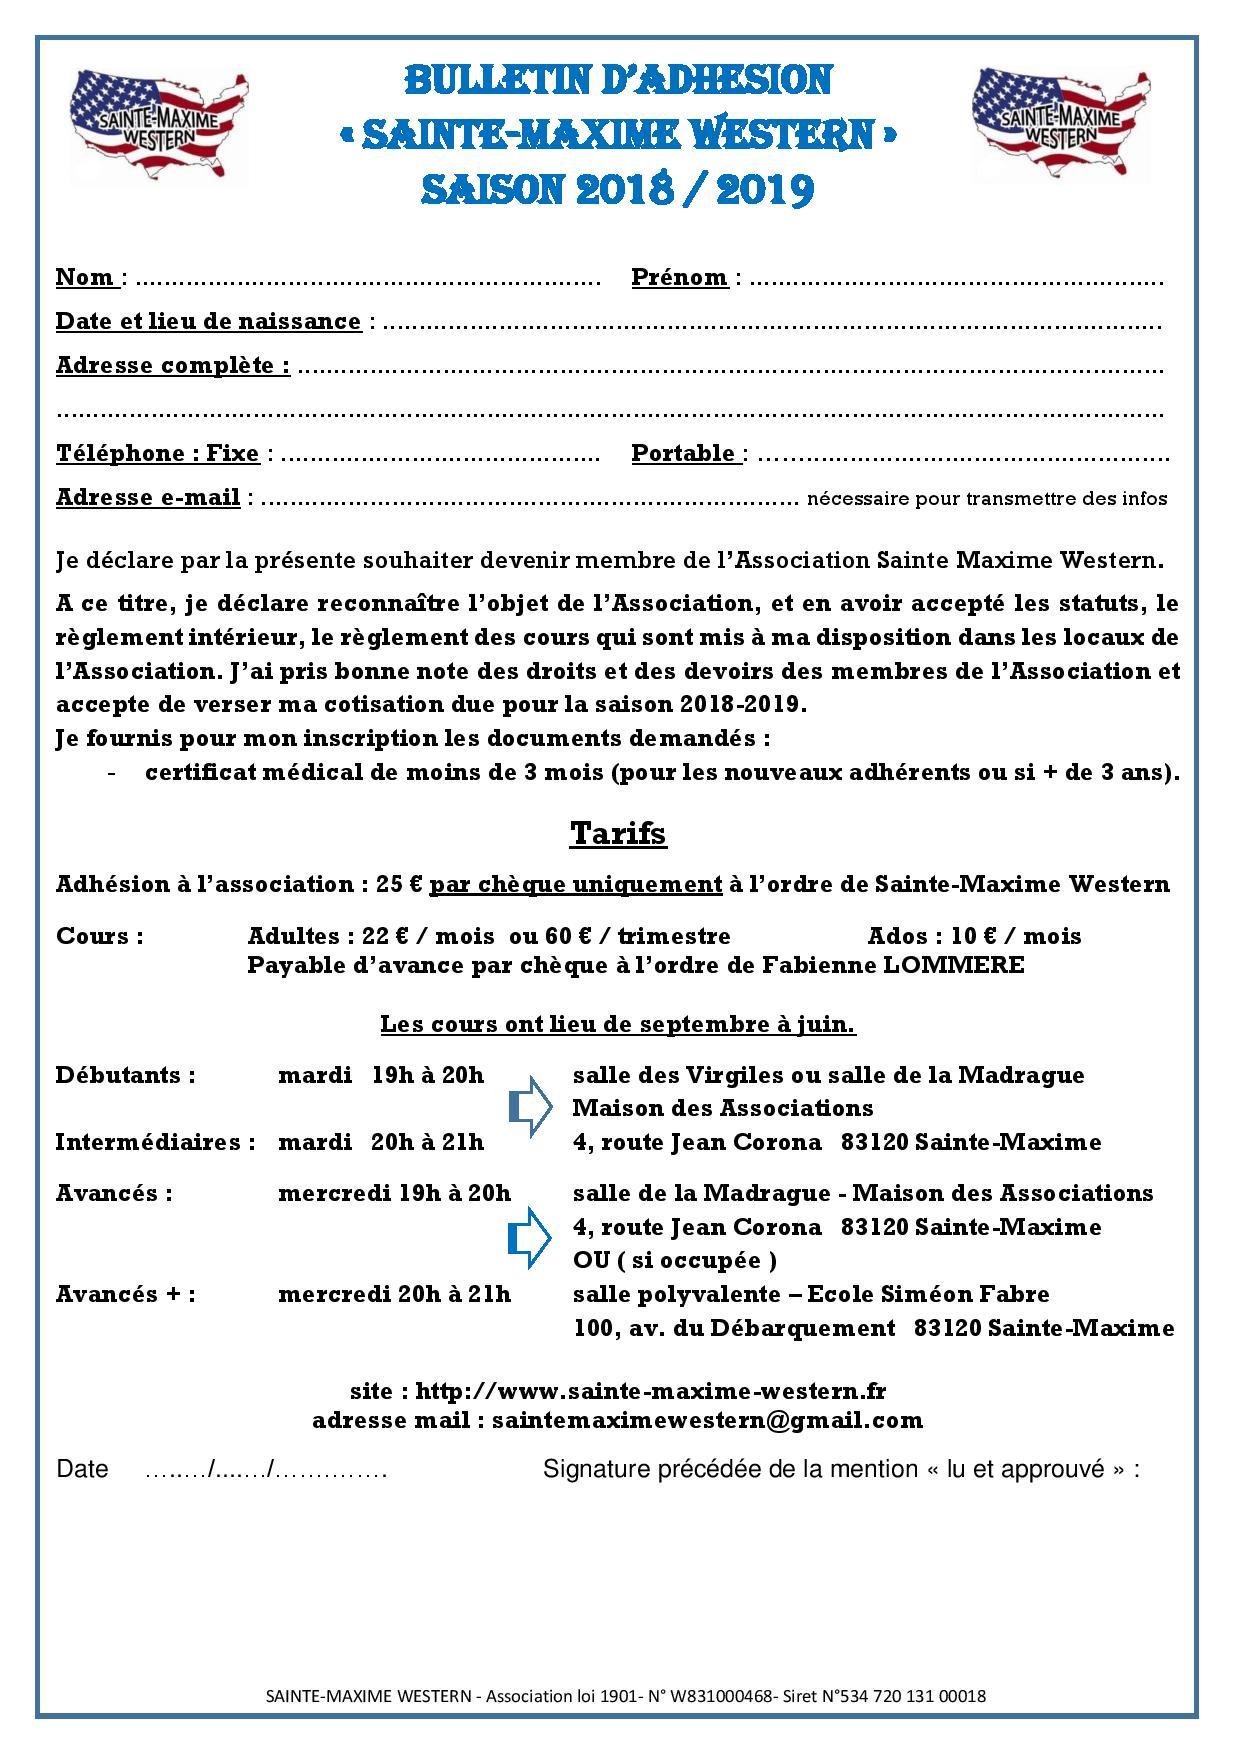 Bulletin d adhesion 2018 2019